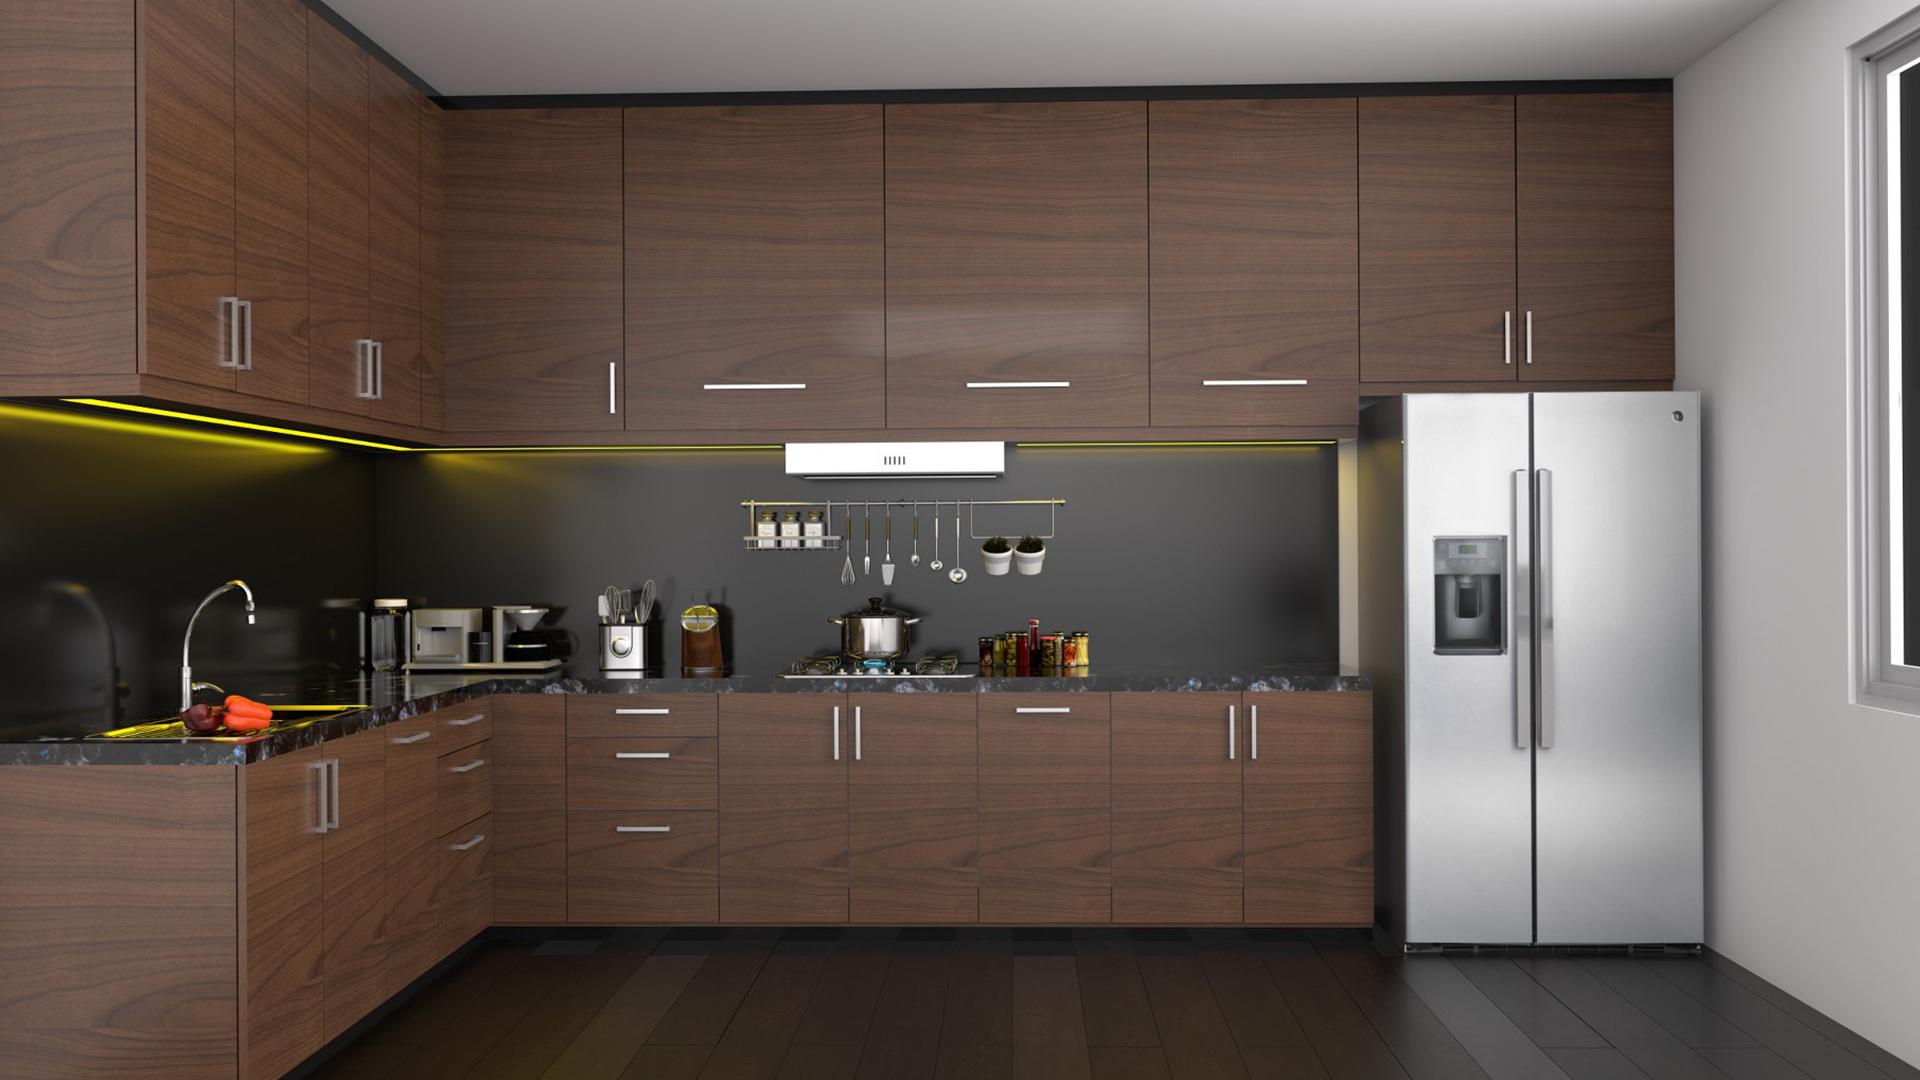 modular kitchen   modular kitchen design   modular kitchen ...